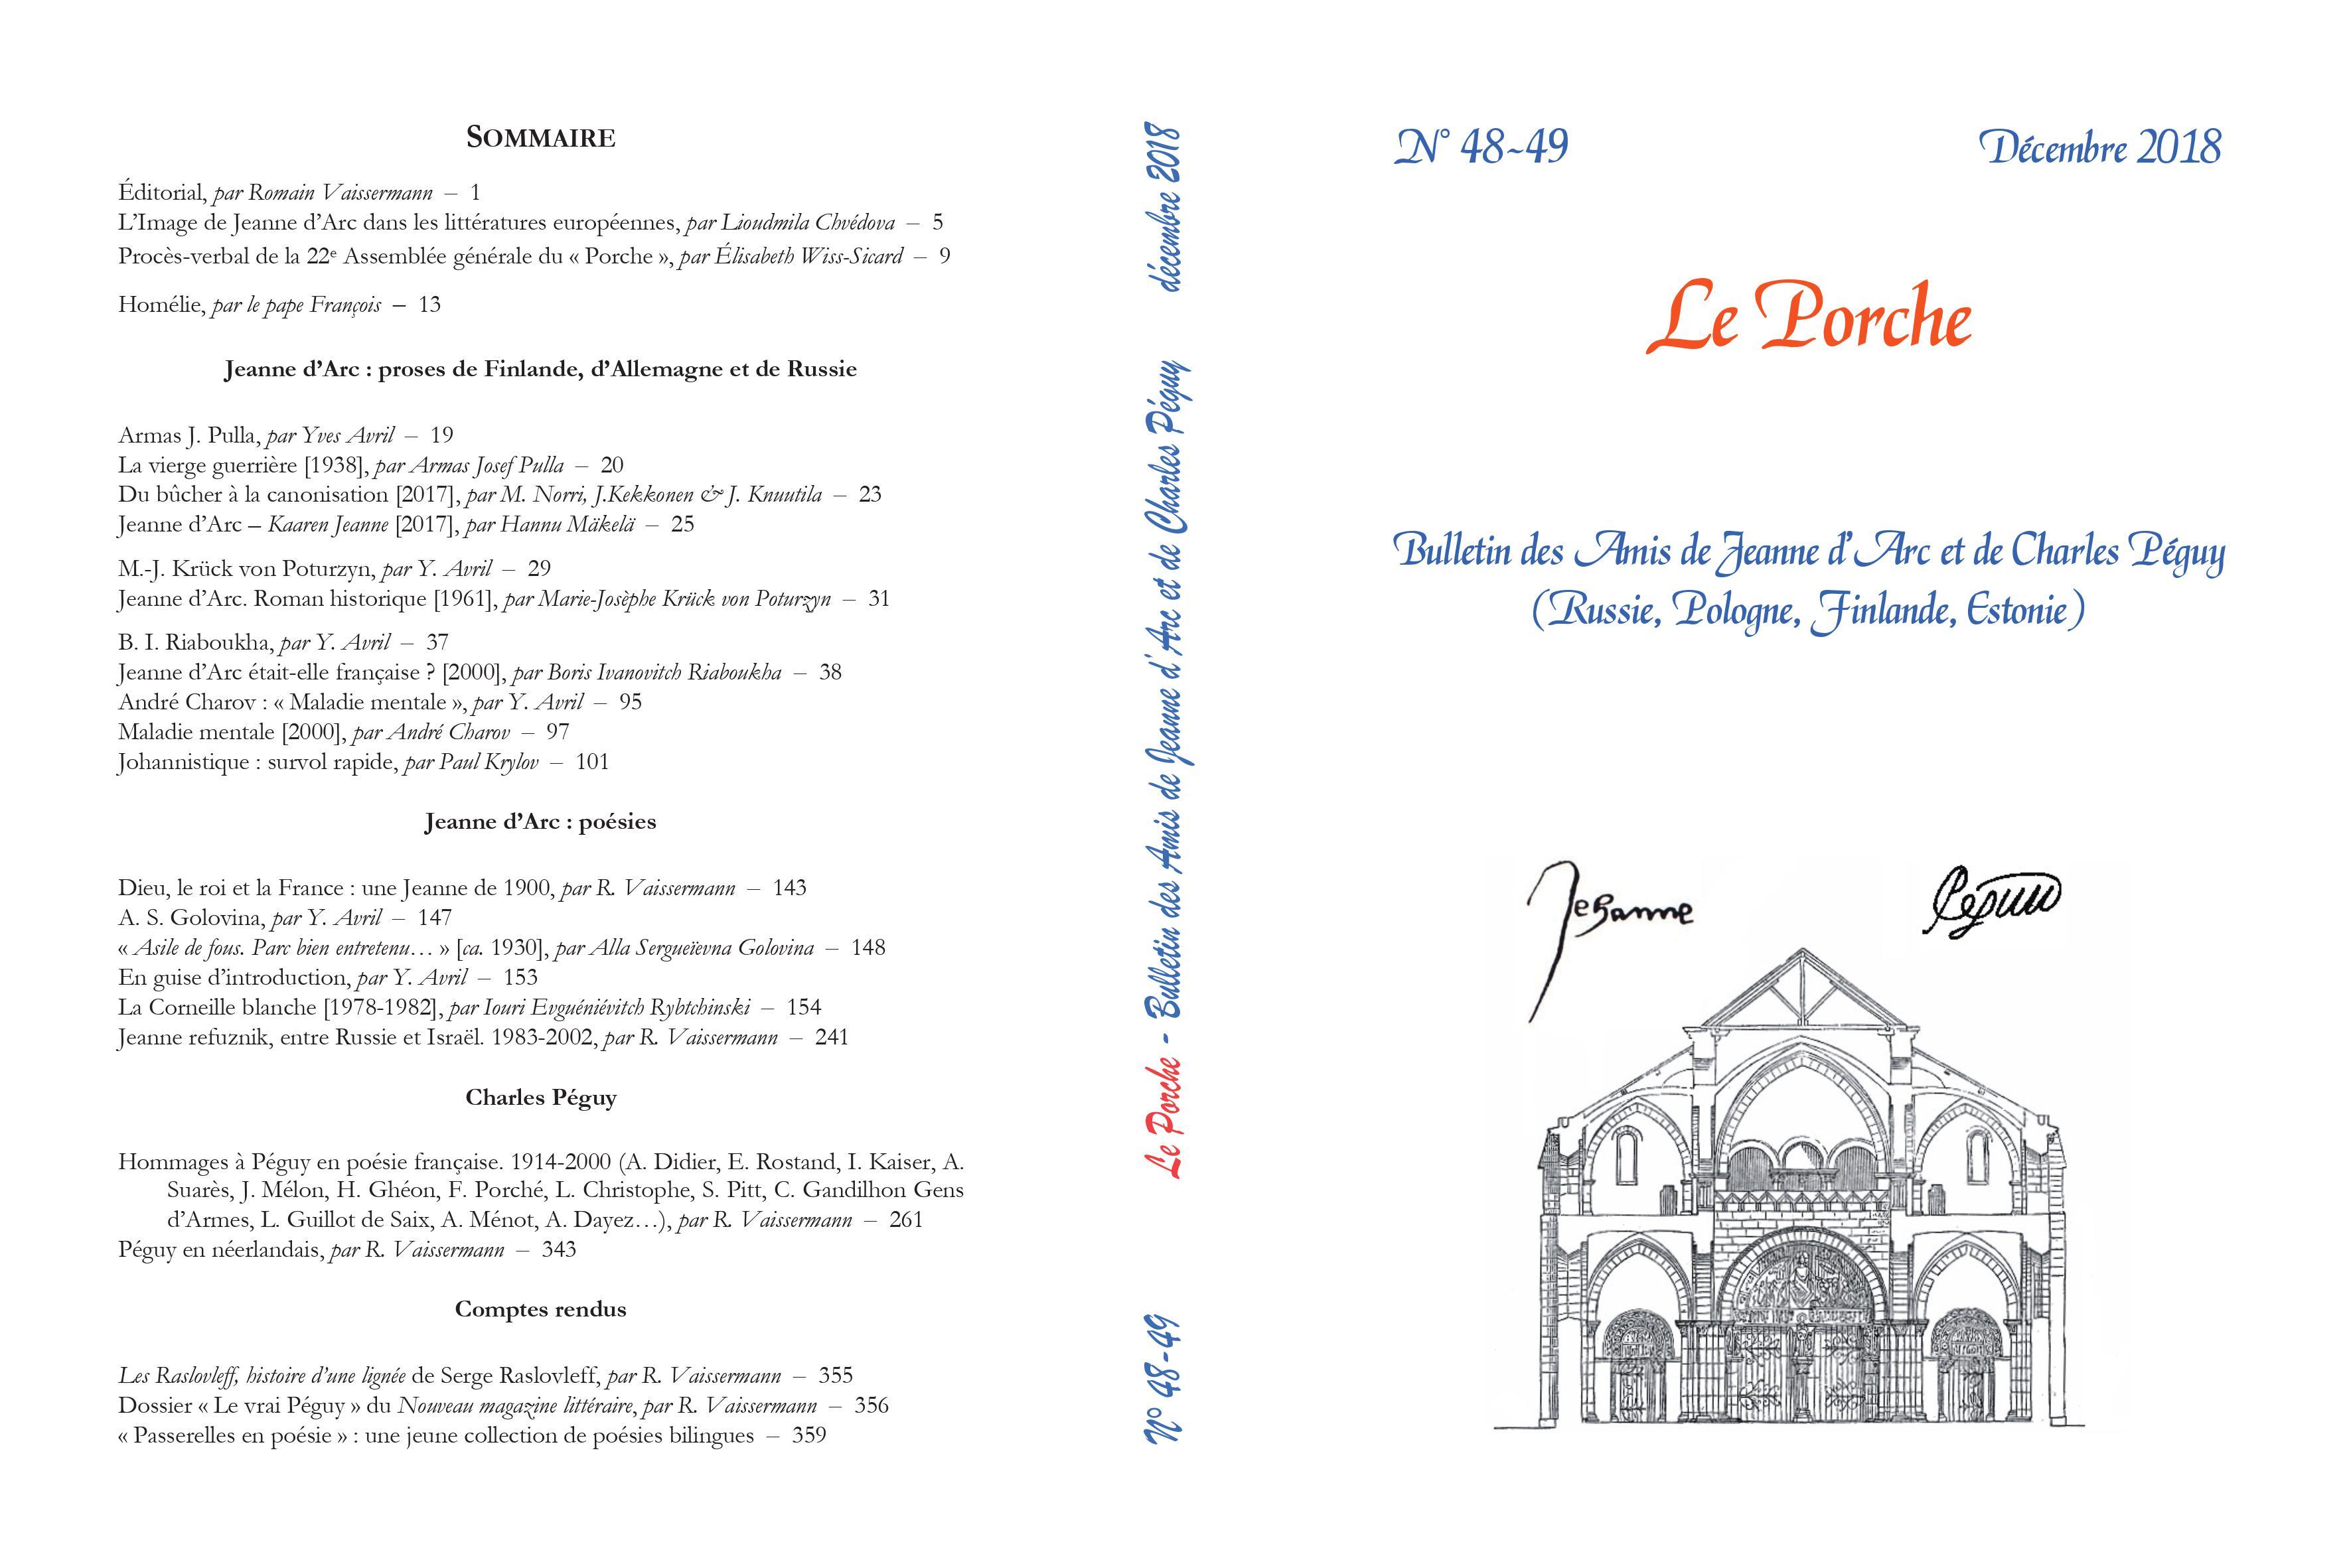 Cv Bibliographie De Romain Vaissermann